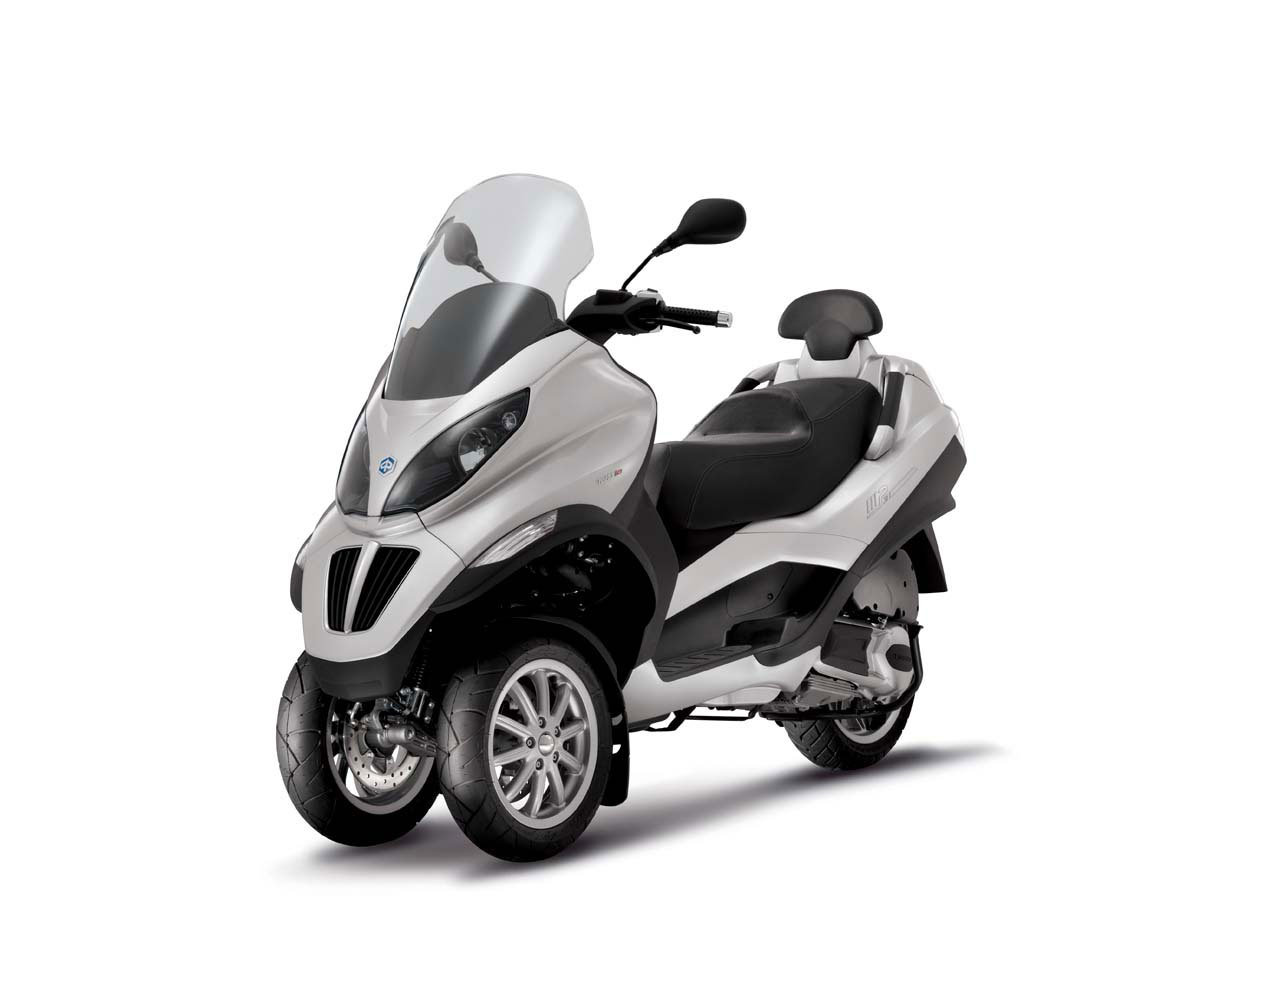 Listino Piaggio Liberty 50 2T Teens Scooter 50 - image 15096_piaggio-mp3300-ie-rl on http://moto.motori.net